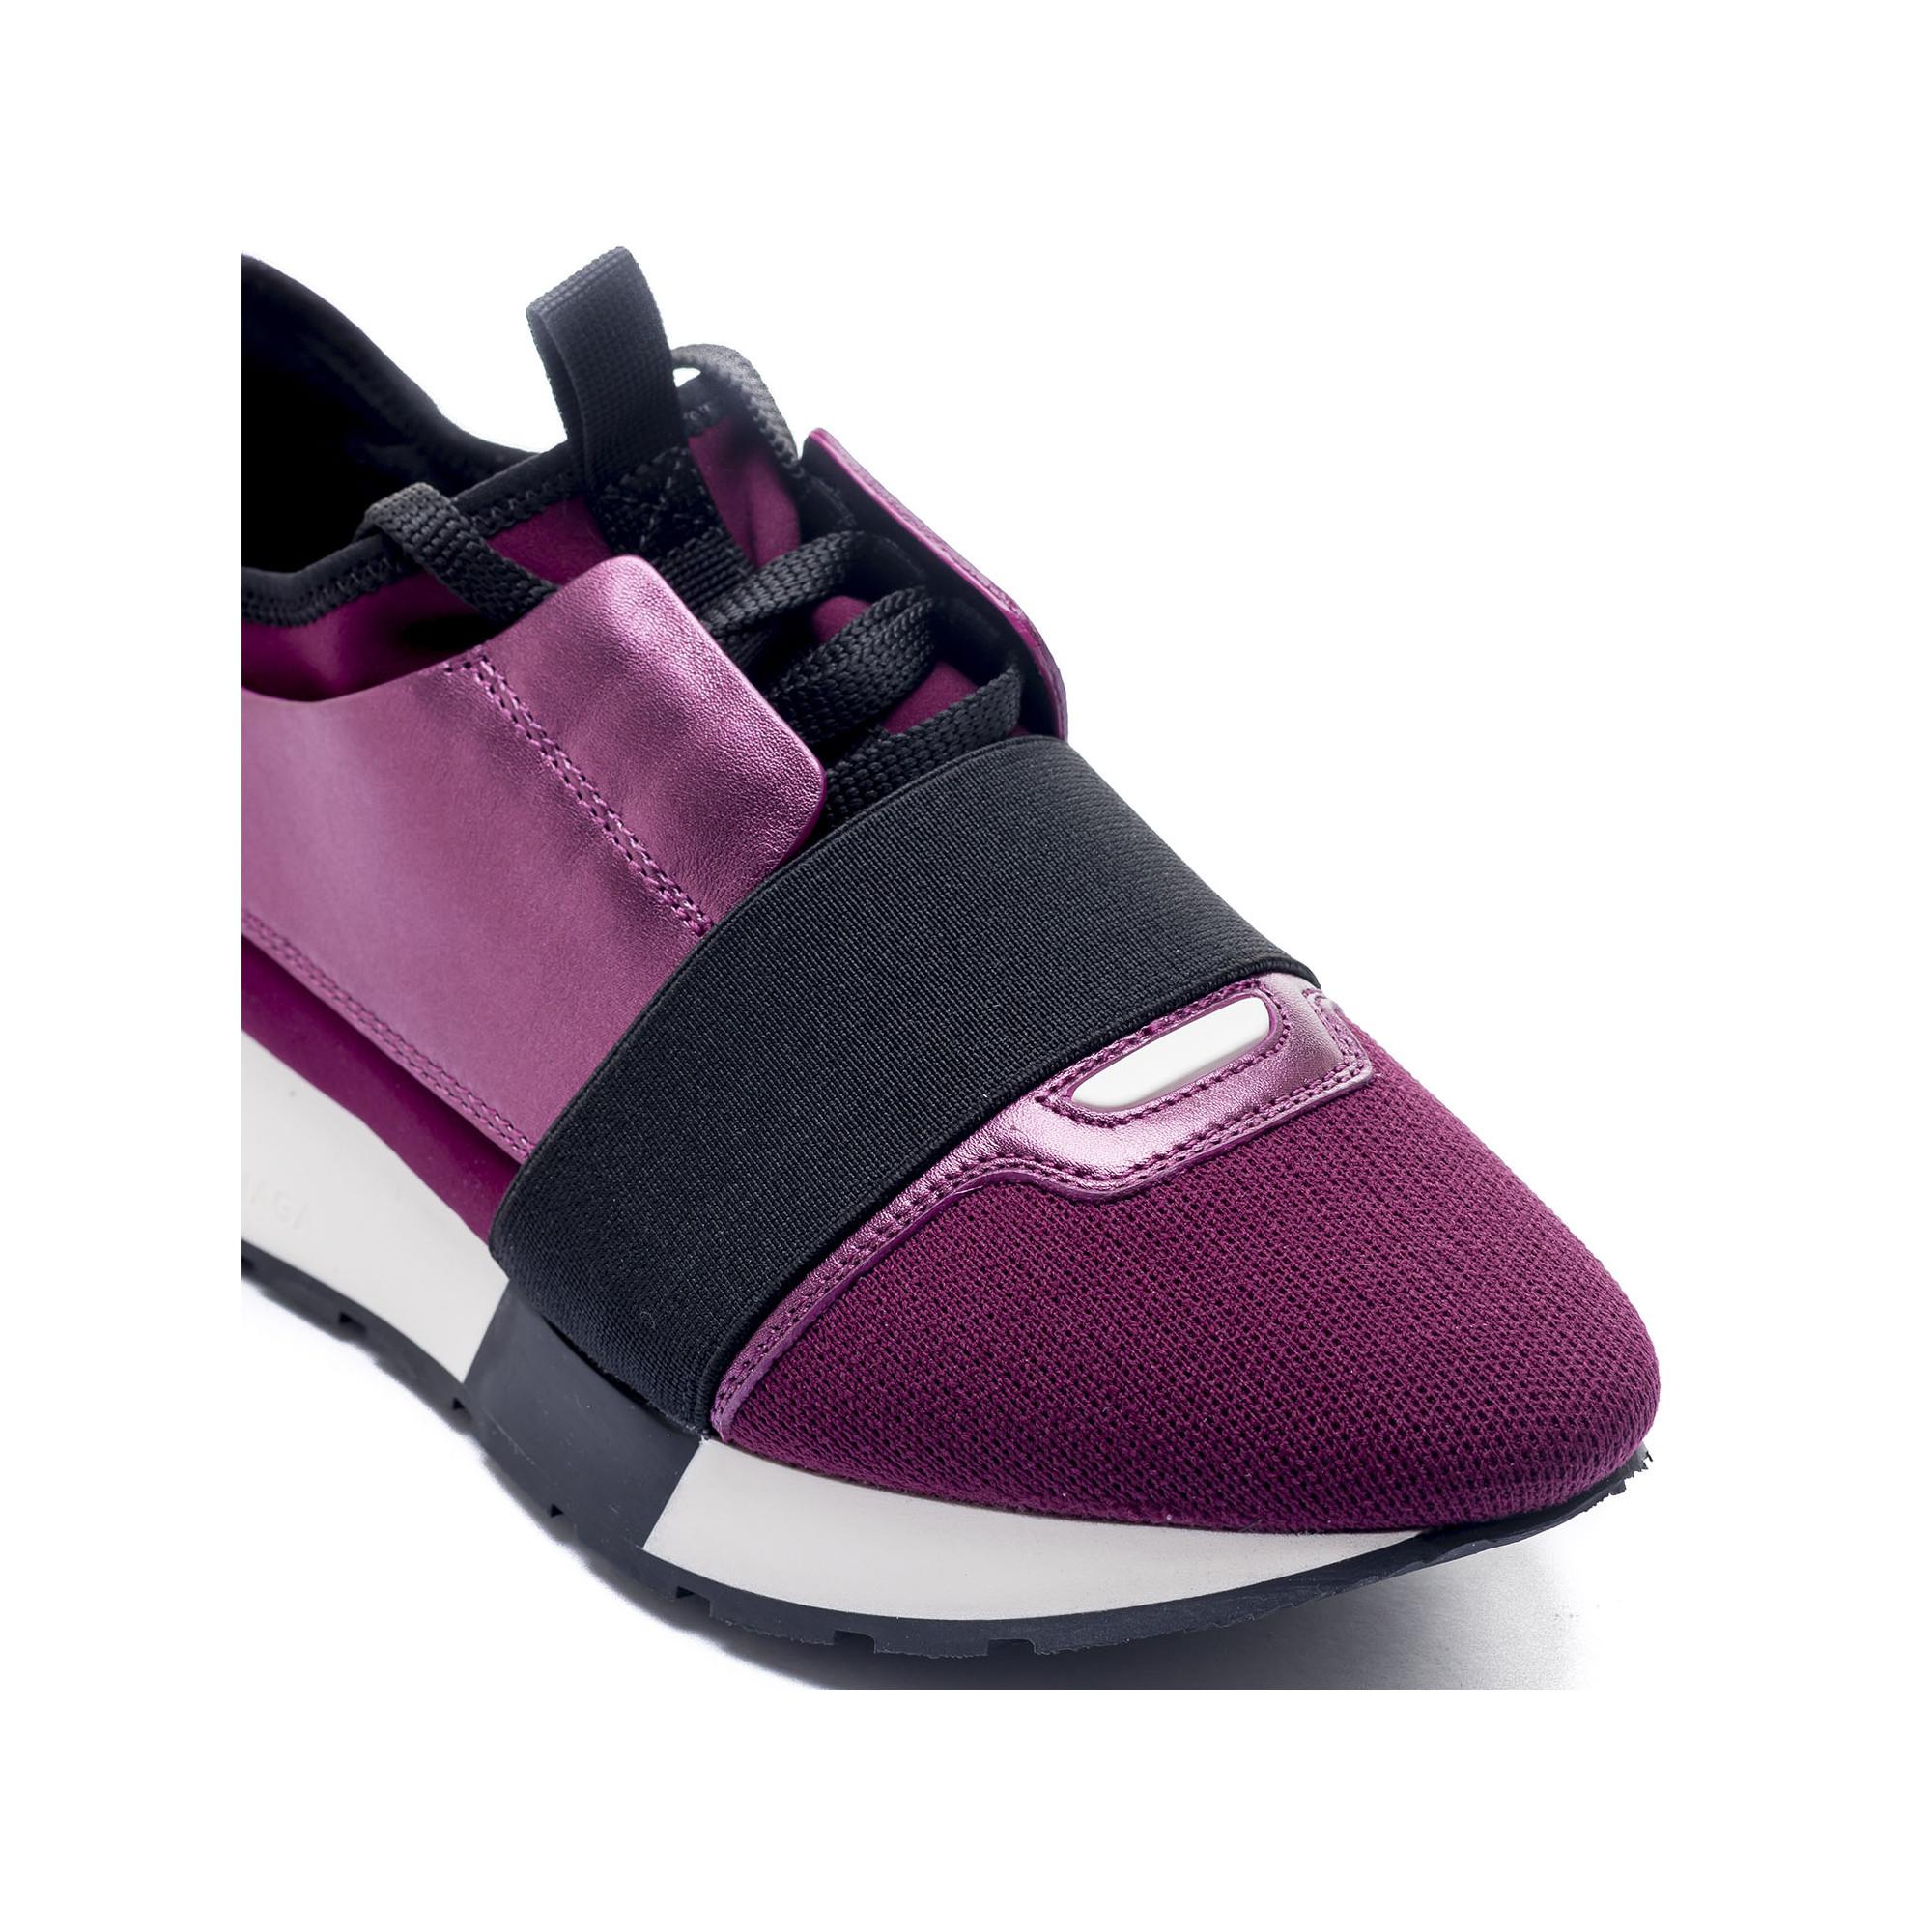 balenciaga sneaker purple. Black Bedroom Furniture Sets. Home Design Ideas